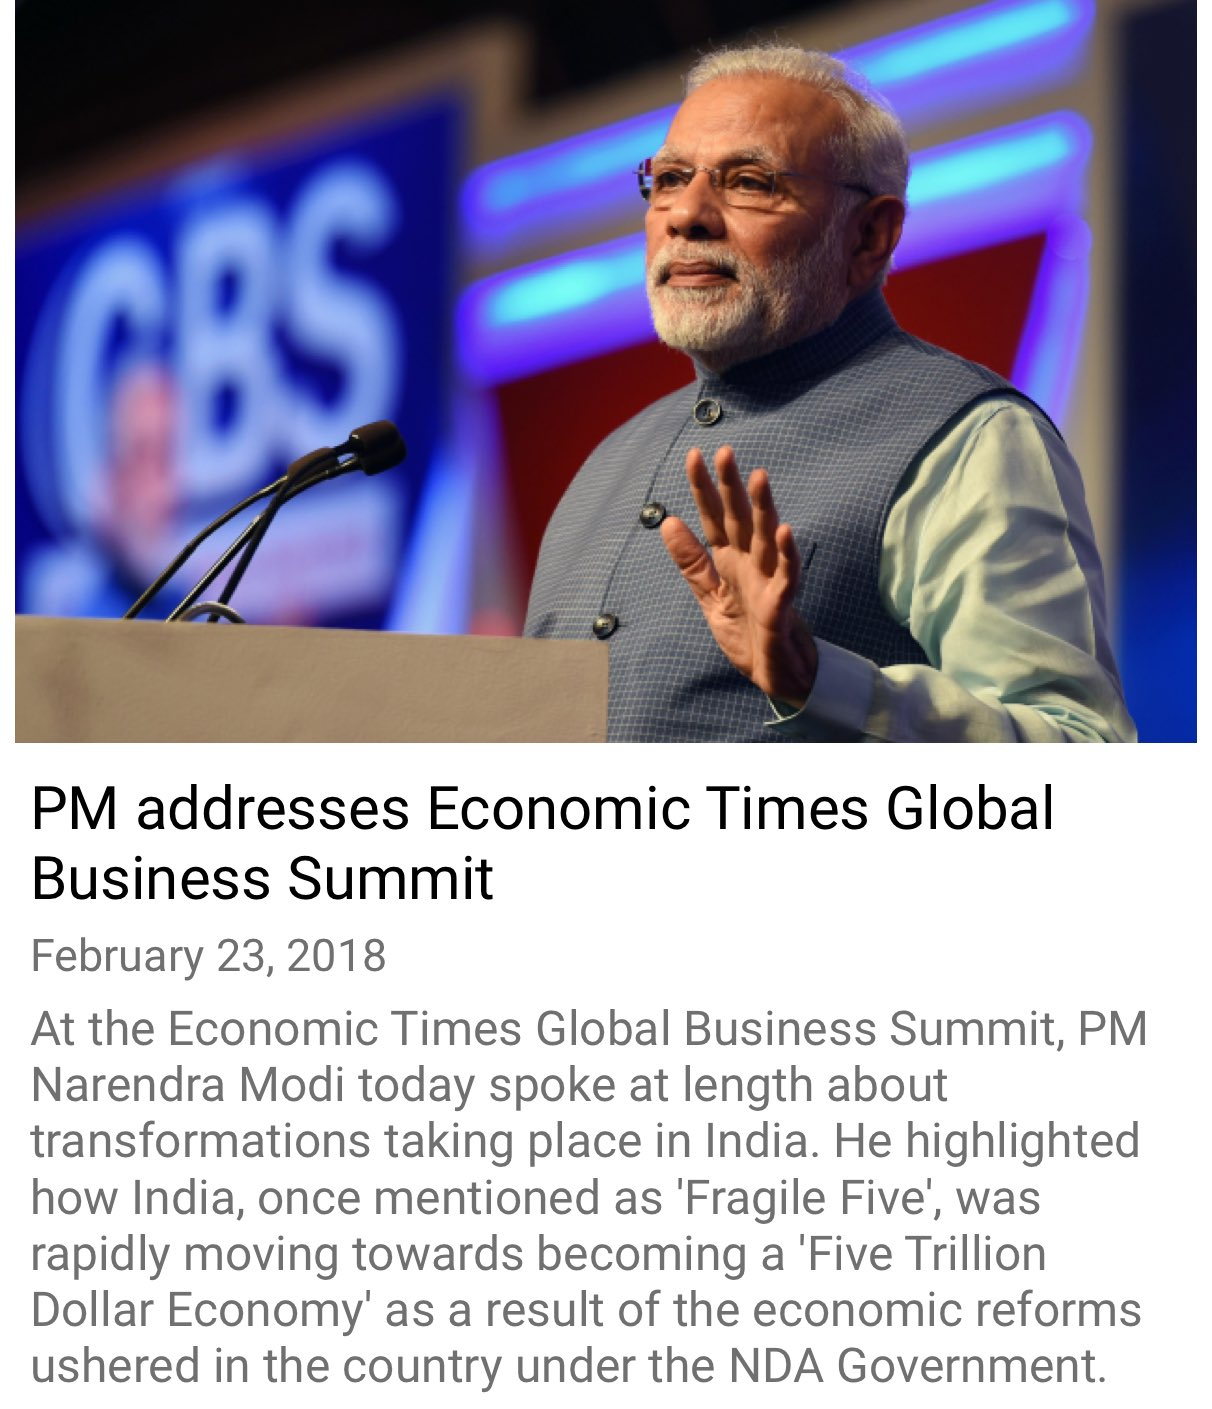 PM addresses Economic Times Global Business Summit https://t.co/77JyMYJRjy  via NMApp https://t.co/VszRx0R6AQ